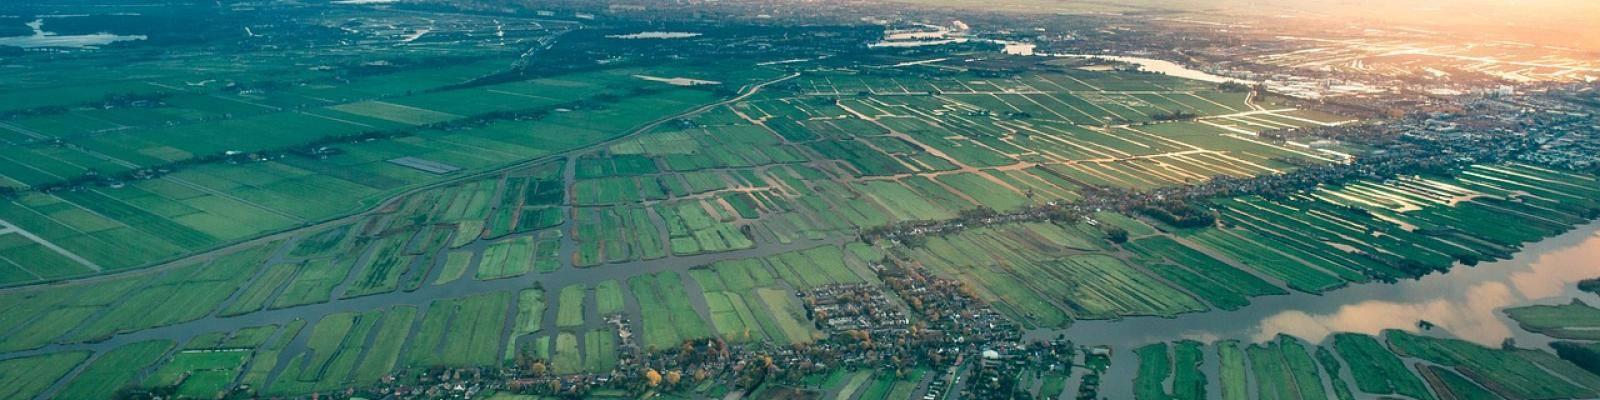 Nederlands landschap platteland